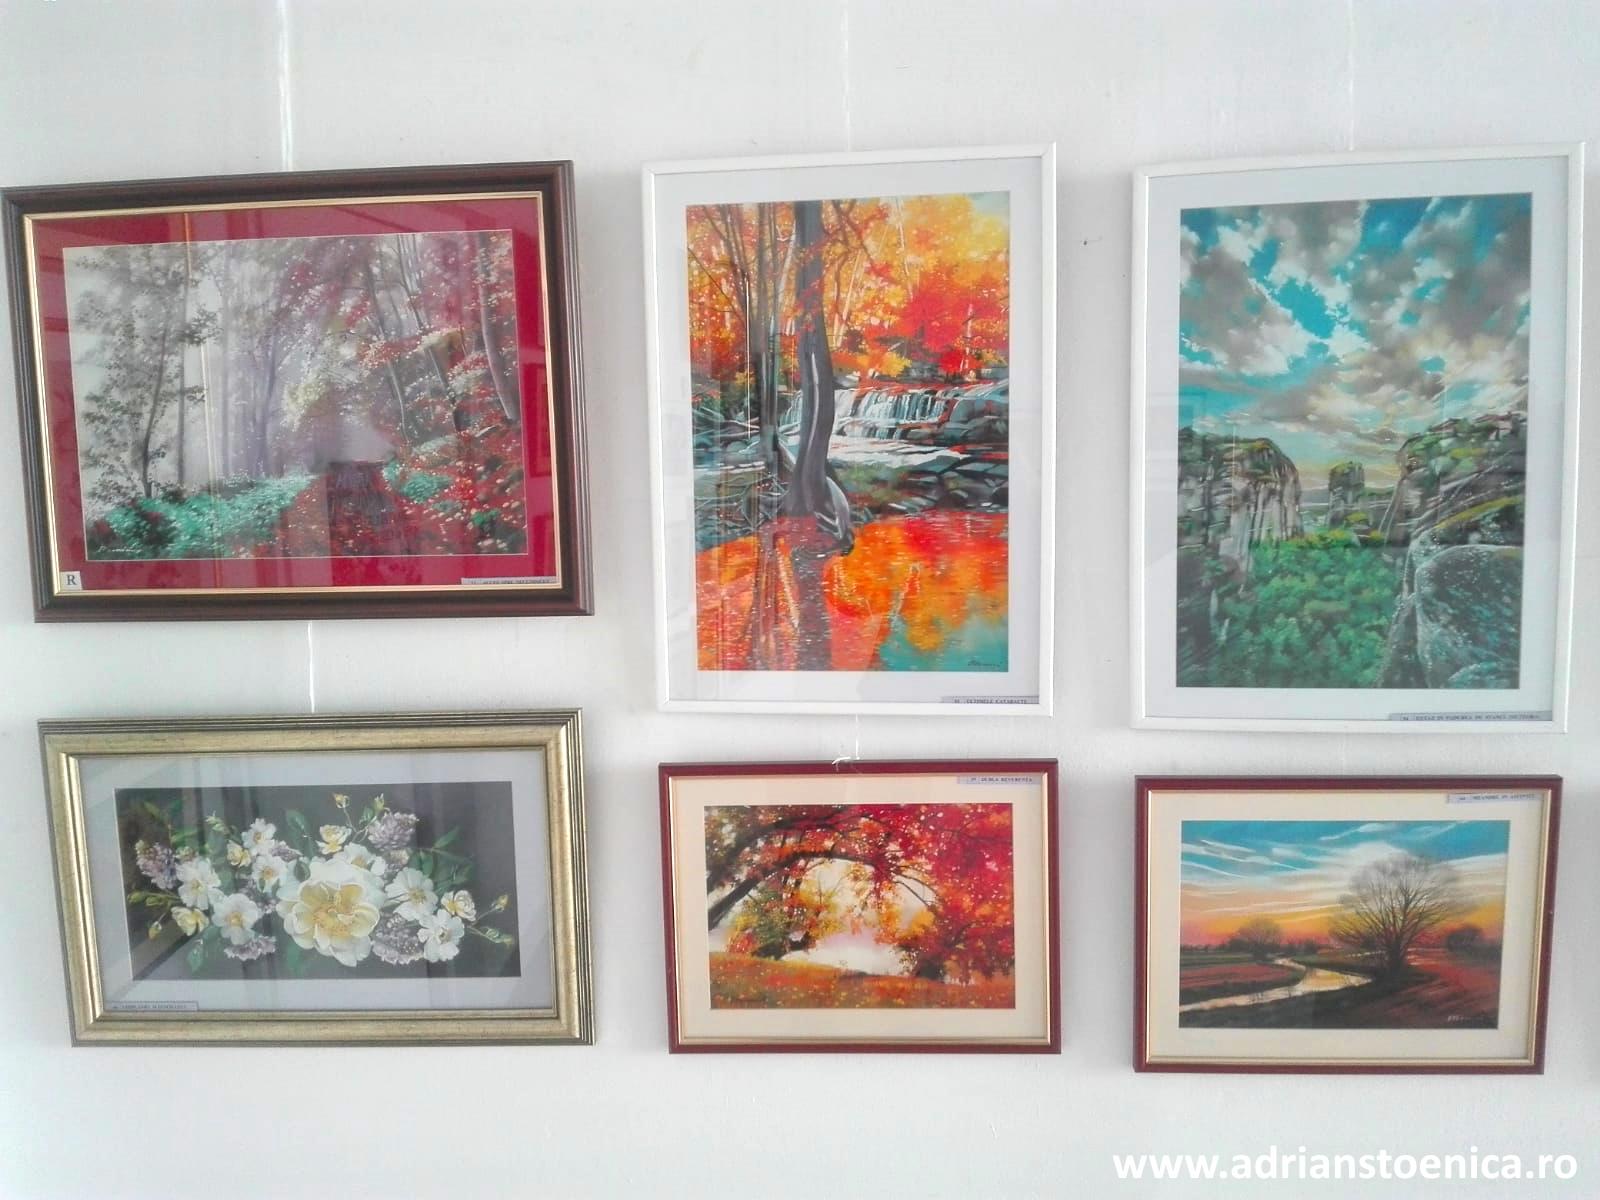 expozitie-de-pictura-brasov-2021-pictor-adrian-stoenica